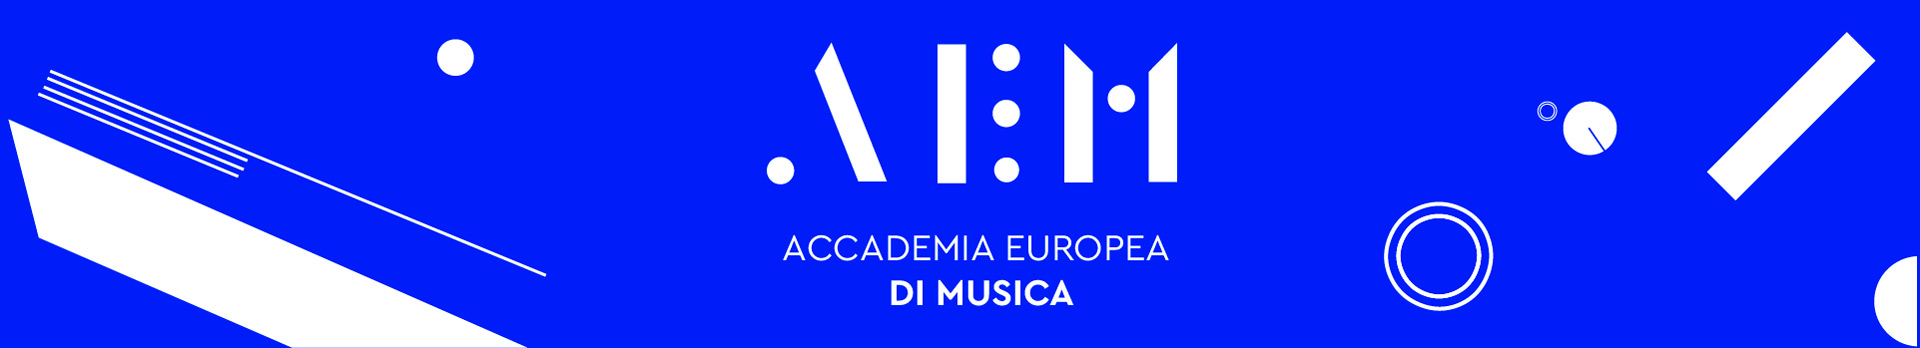 accademia-europea-di-musica-slide-1